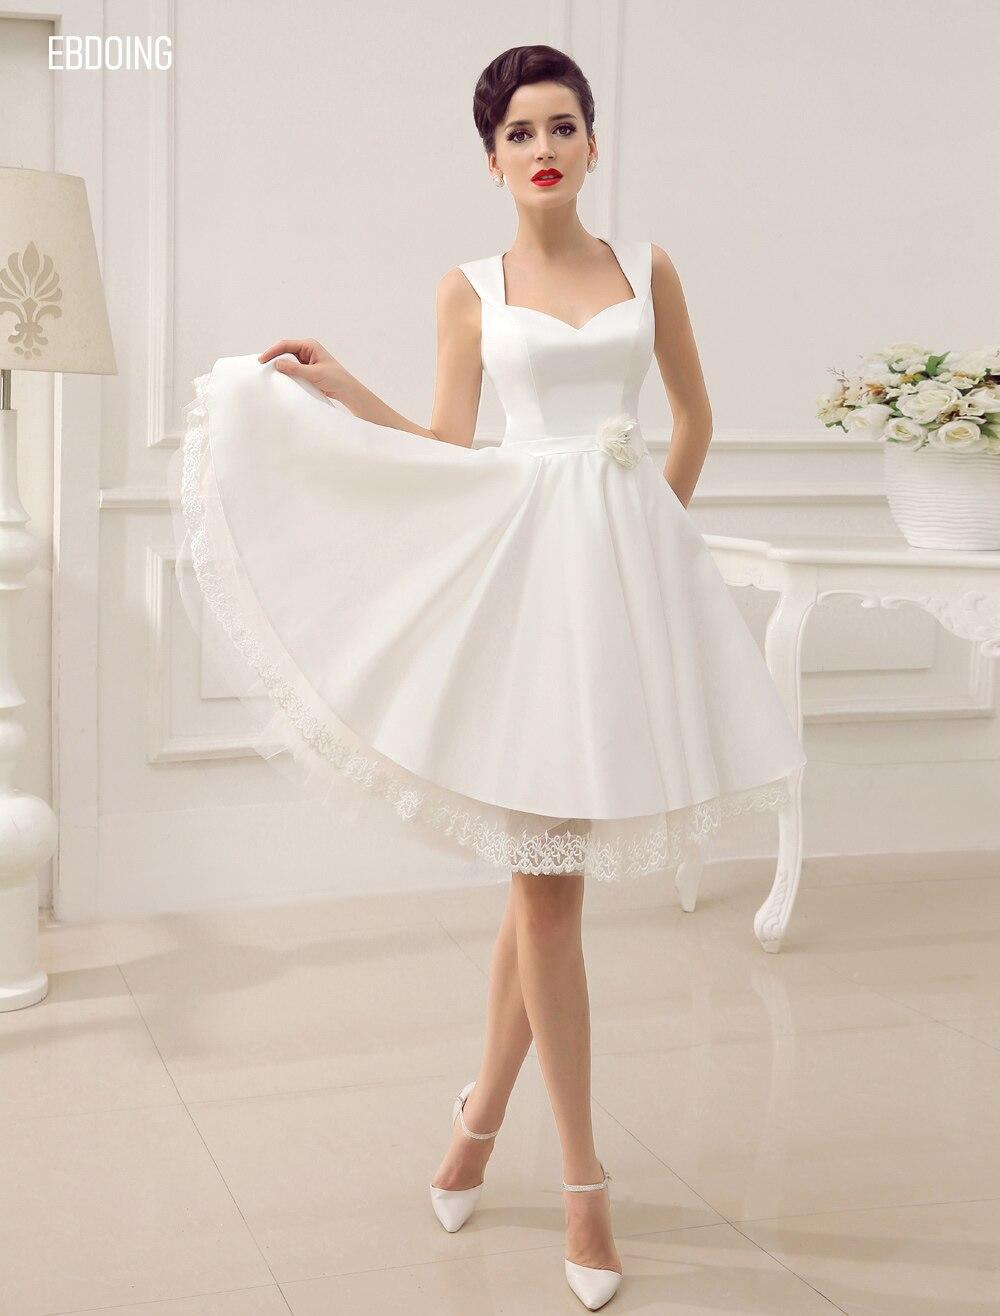 Newest Formal Dress A-line Sweetheart Neckline Knee-Length Vestidos De Festa Plus Sizes Open-Back Evening Prom Party Gown